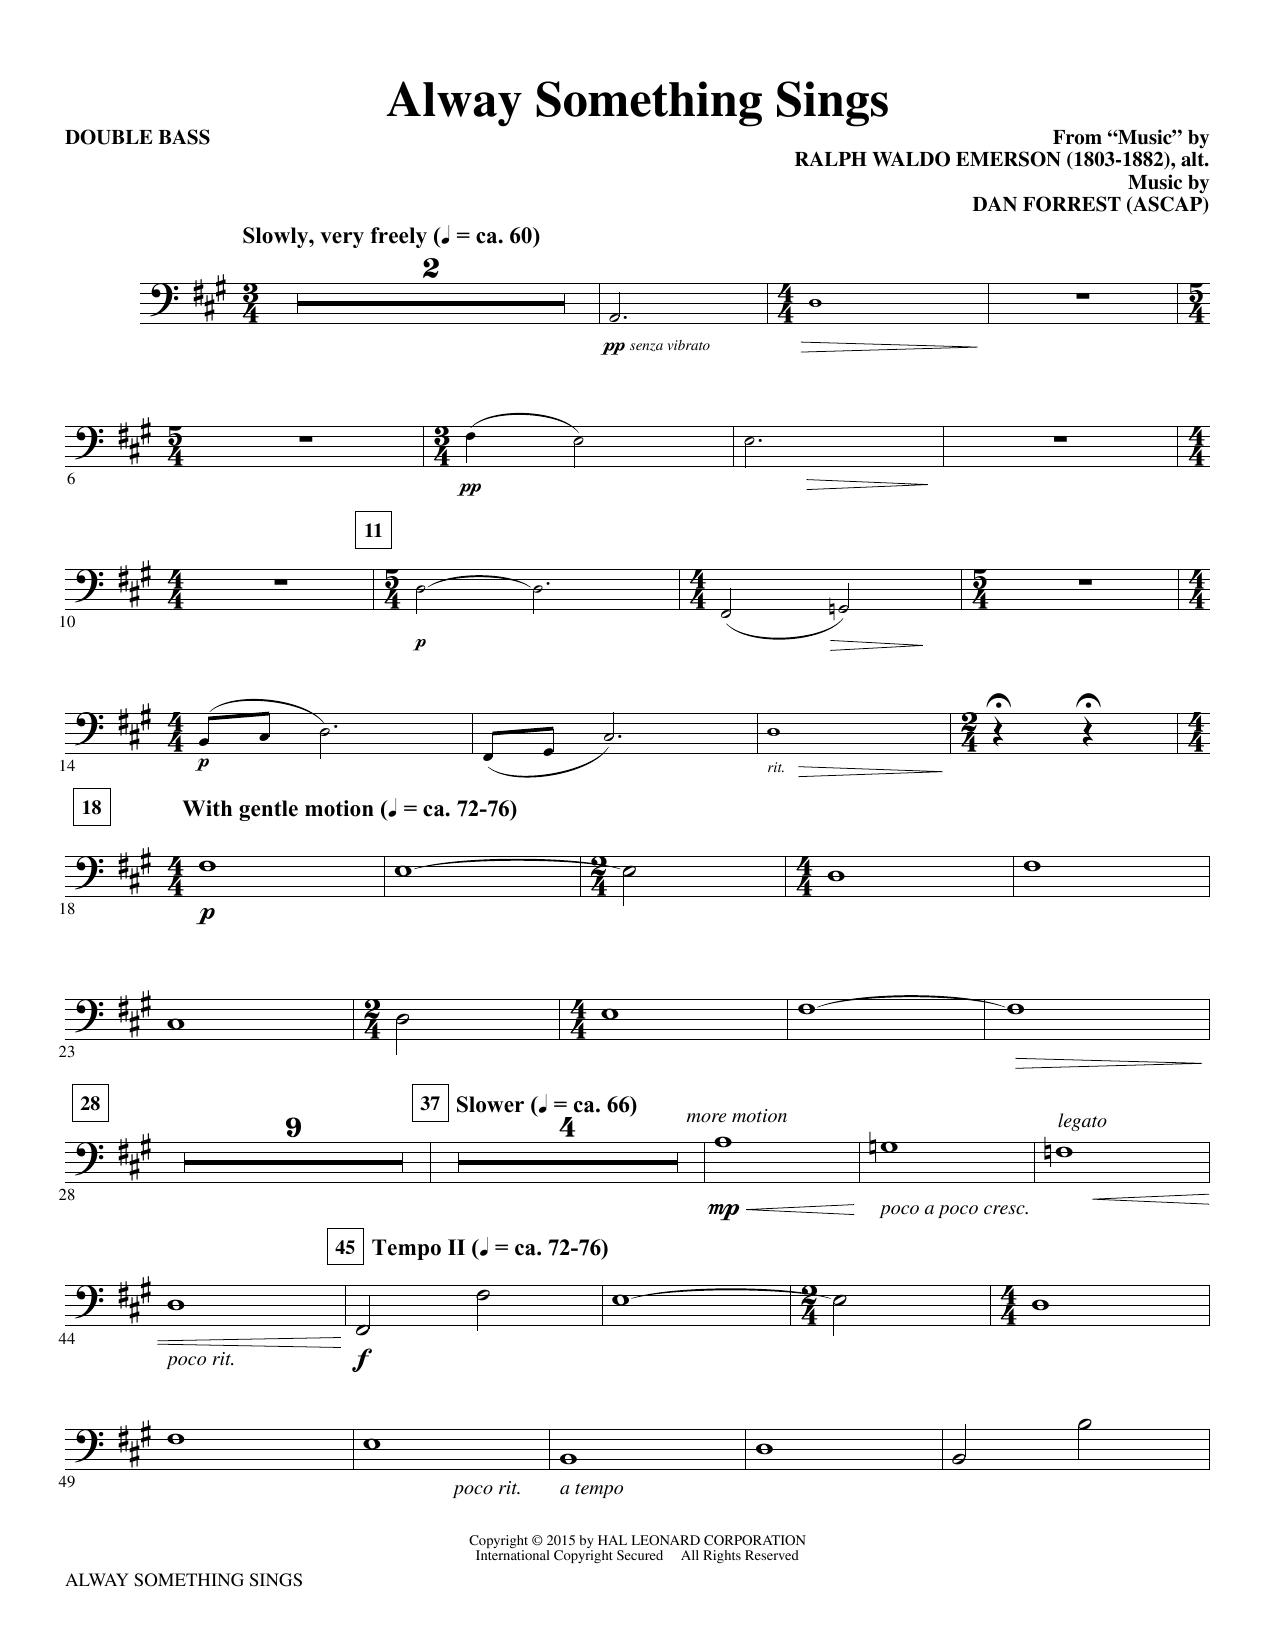 Alway Something Sings - Double Bass sheet music